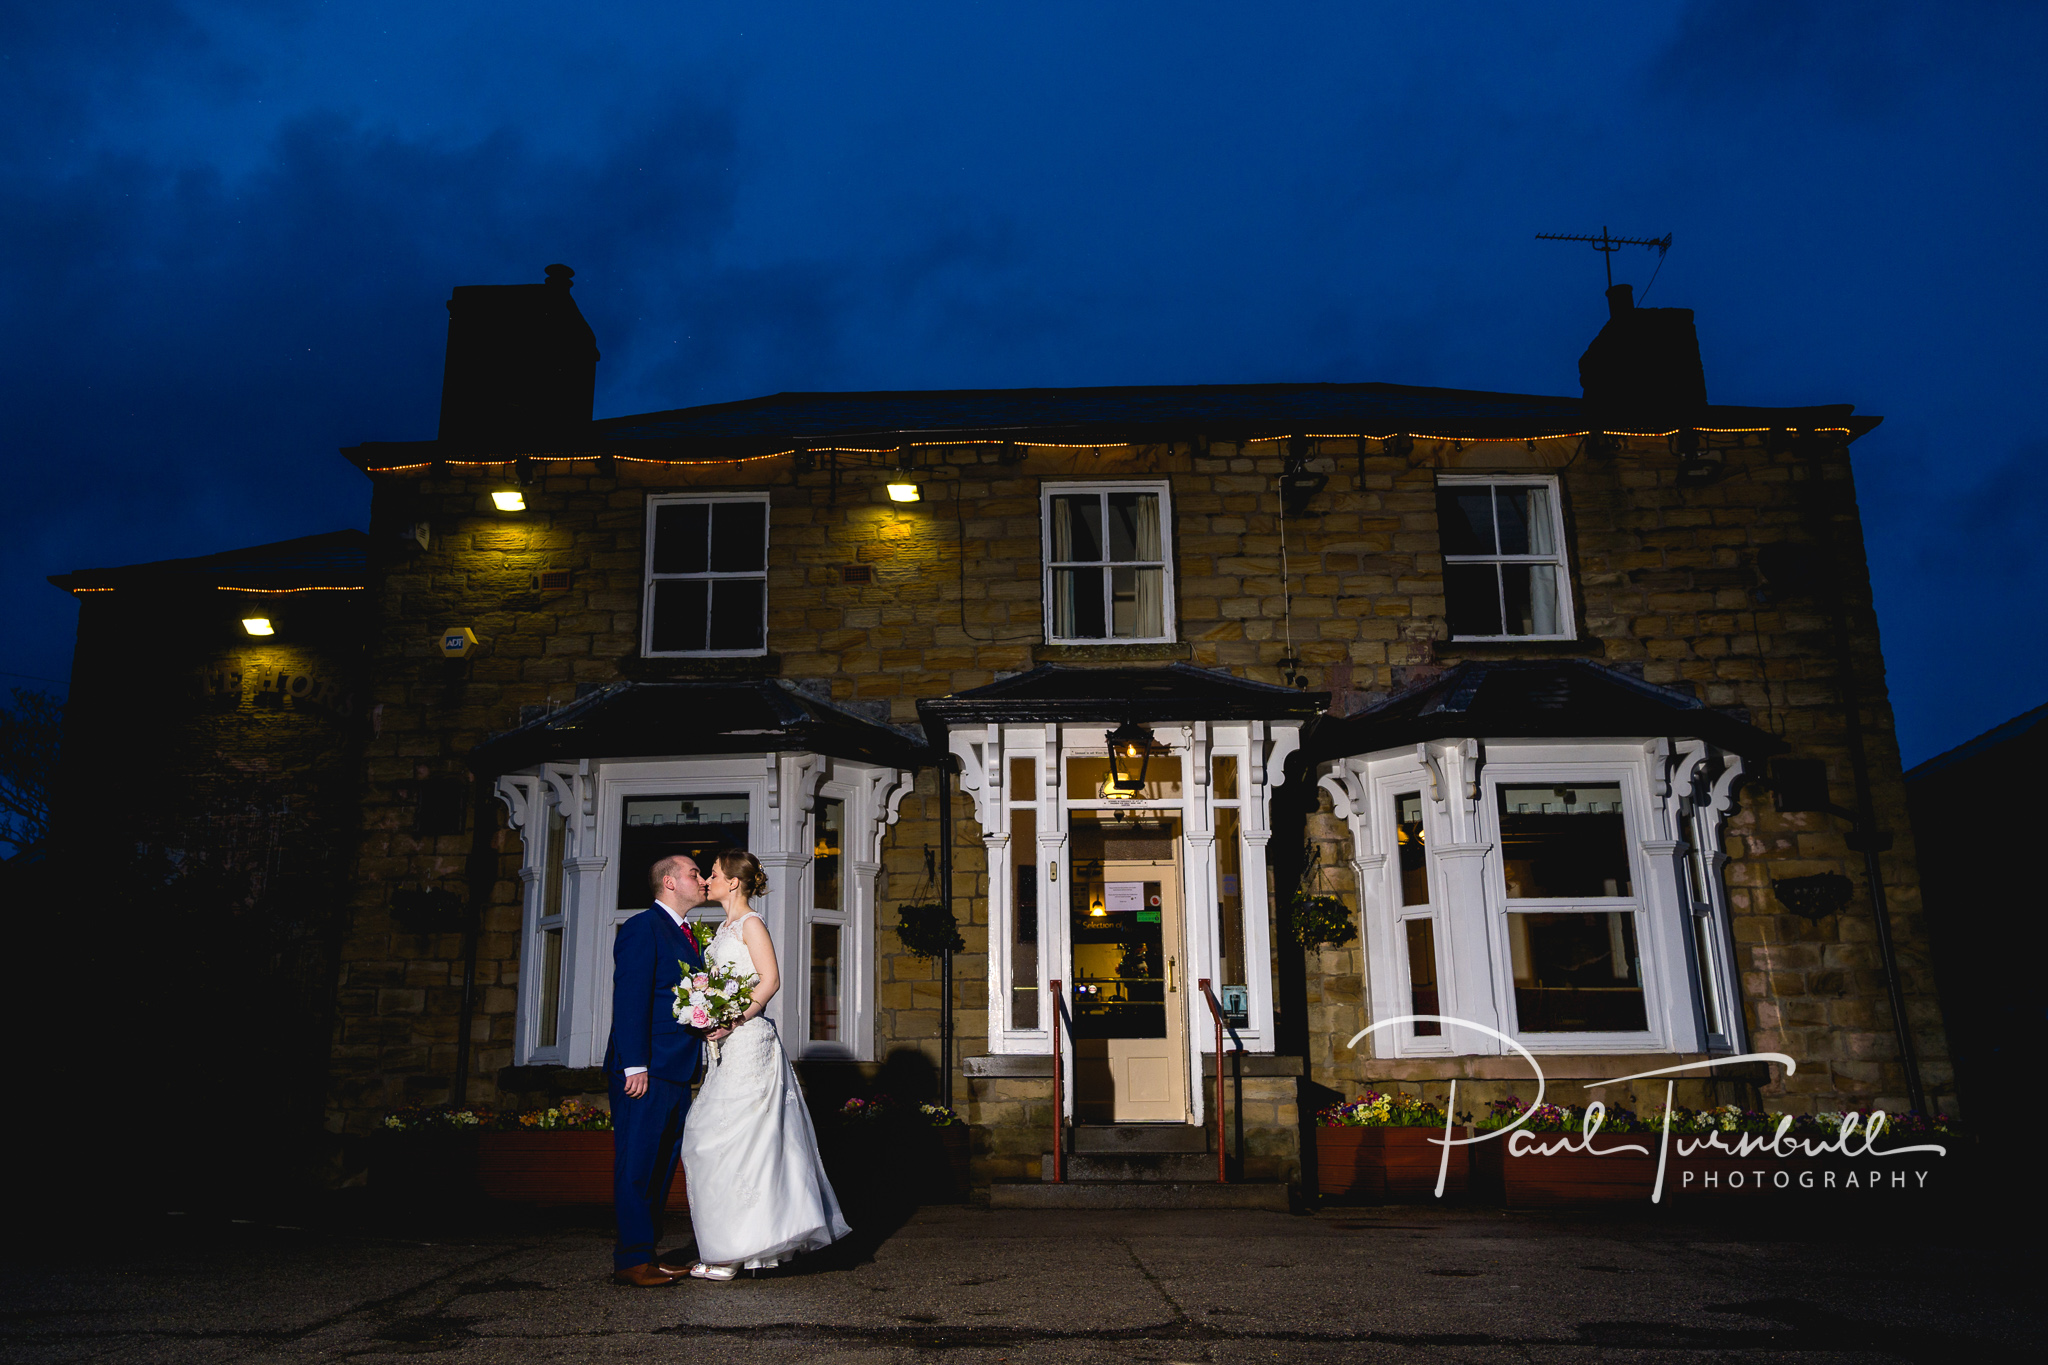 Laura & Keanu - Pontefract Town Hall, Yorkshire